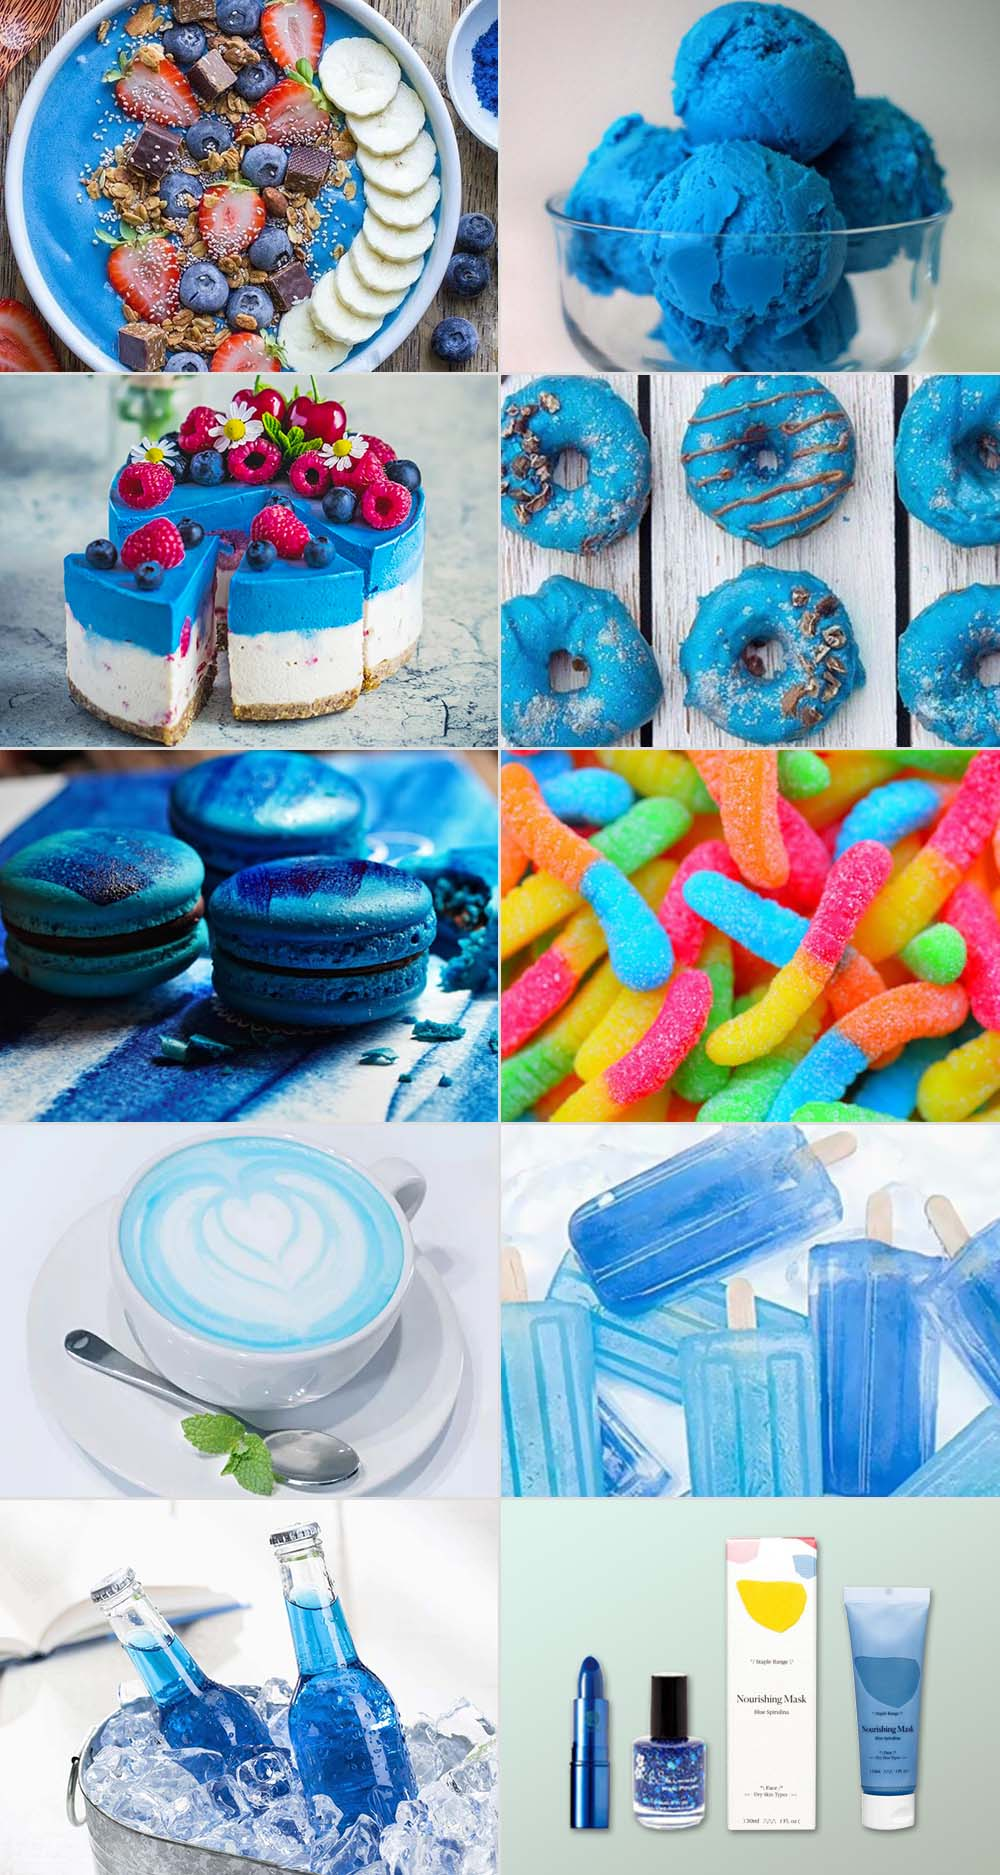 Blue Spirulina Products